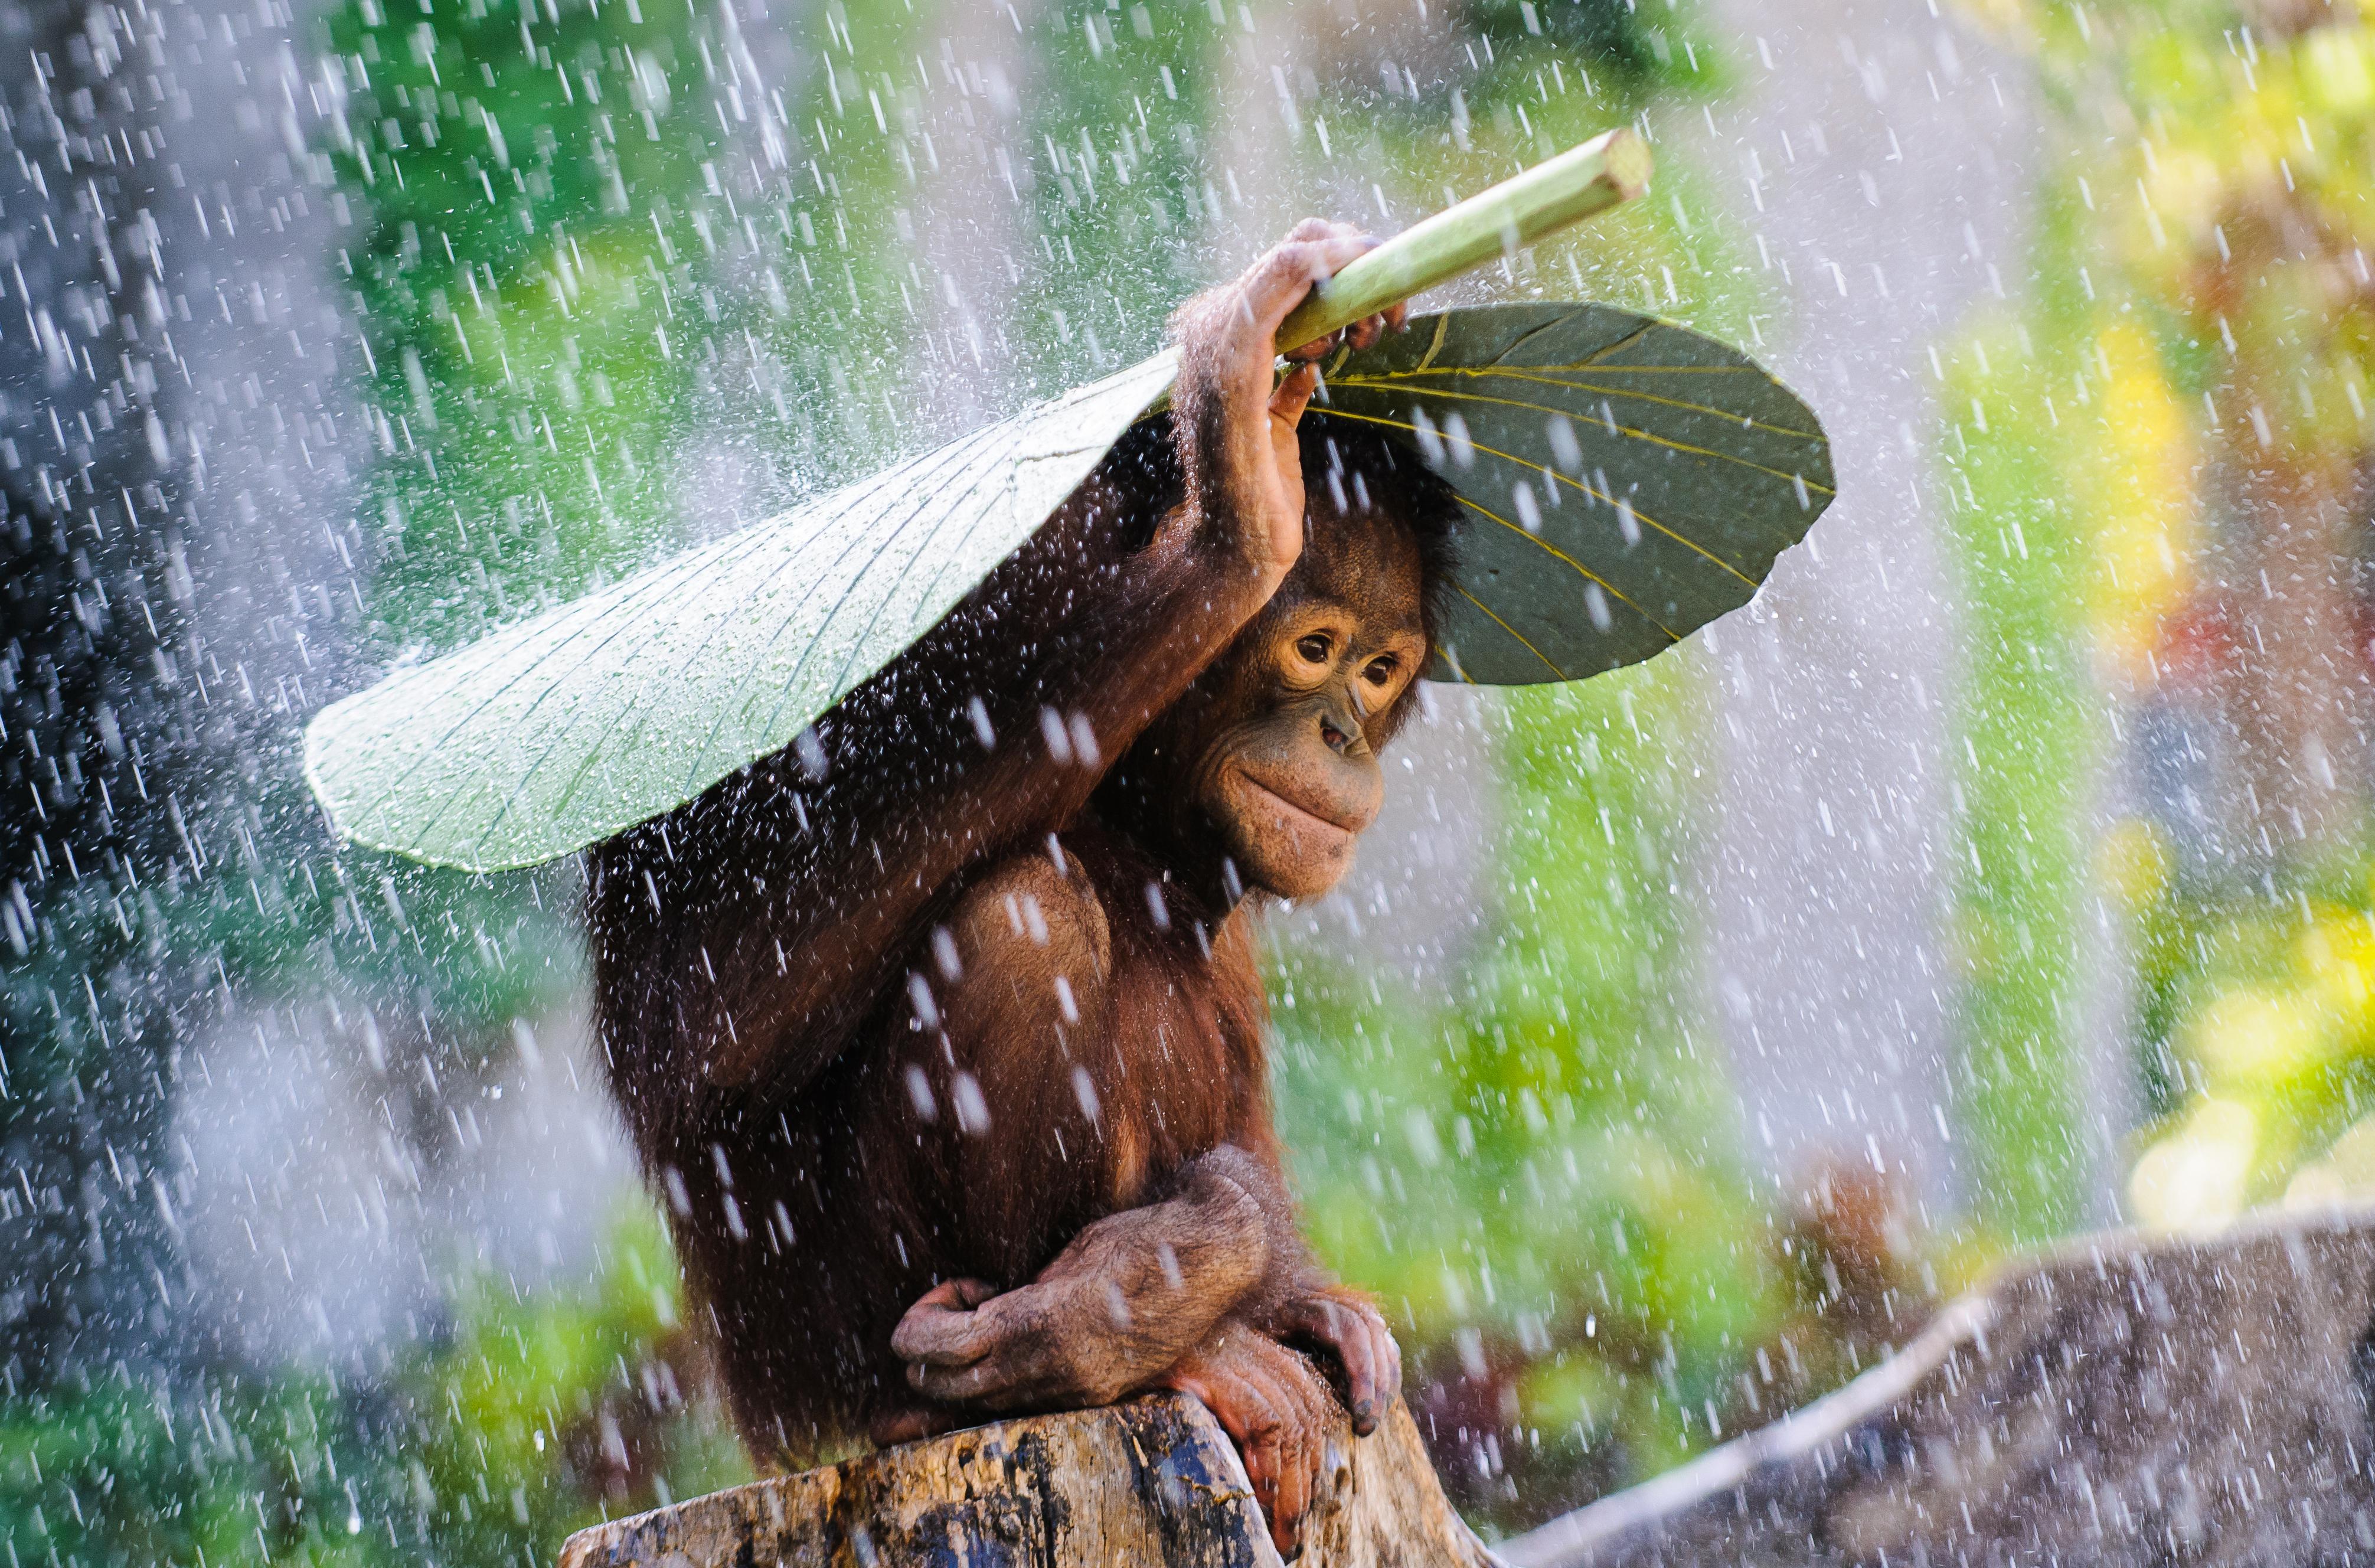 Andrew Suryono, Winner, Indonesia, National Award, 2015 Sony World Photography Awards.jpg